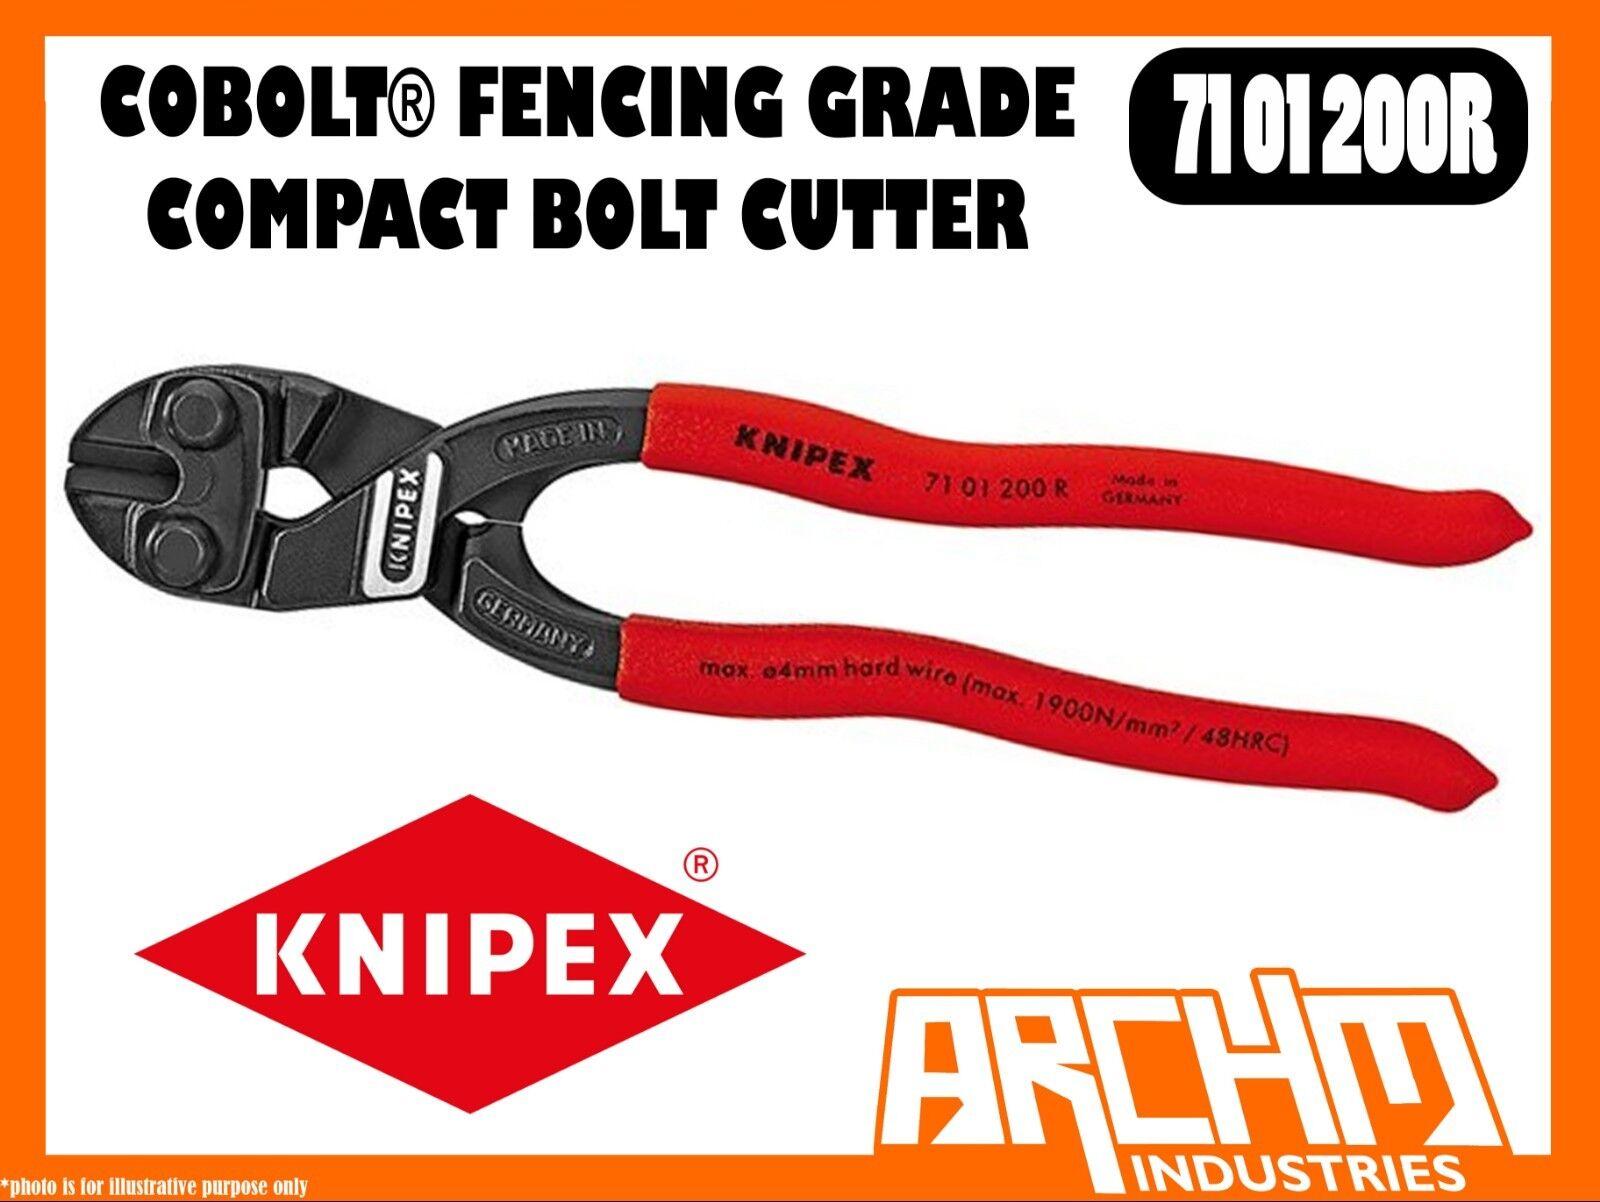 KNIPEX 7101200R - COBOLT® - COMPACT BOLT CUTTER FENCING GRADE - 200MM CUTTING